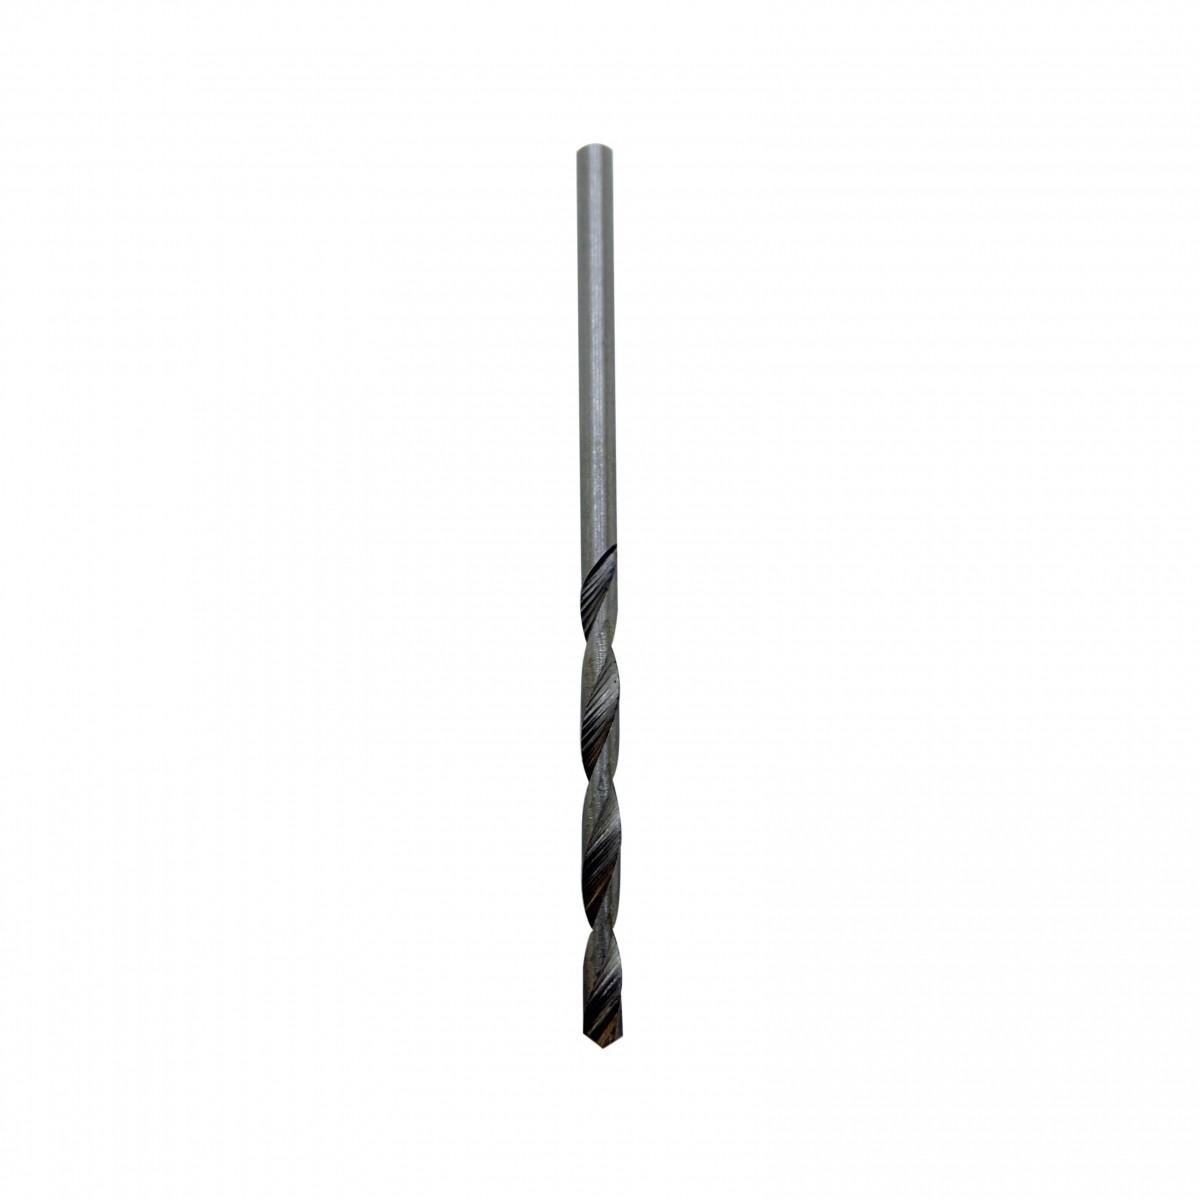 Broca Helicoidal Cilíndrica Rocast- Hss 2,5mm Din 338 - Bh22